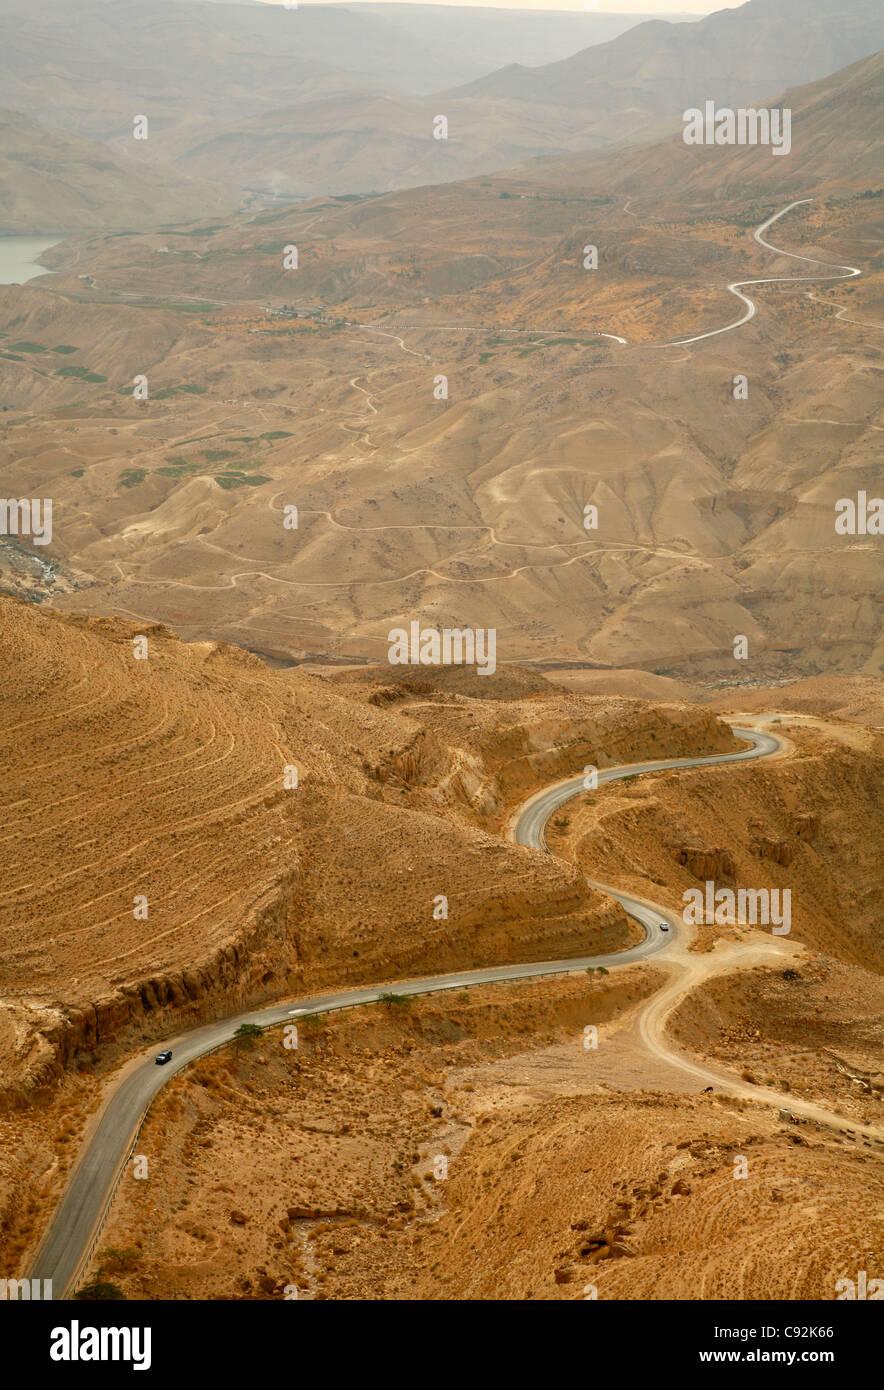 Part of the Kings Highway that runs through Wadi Mujib escarpment, Jordan. - Stock Image